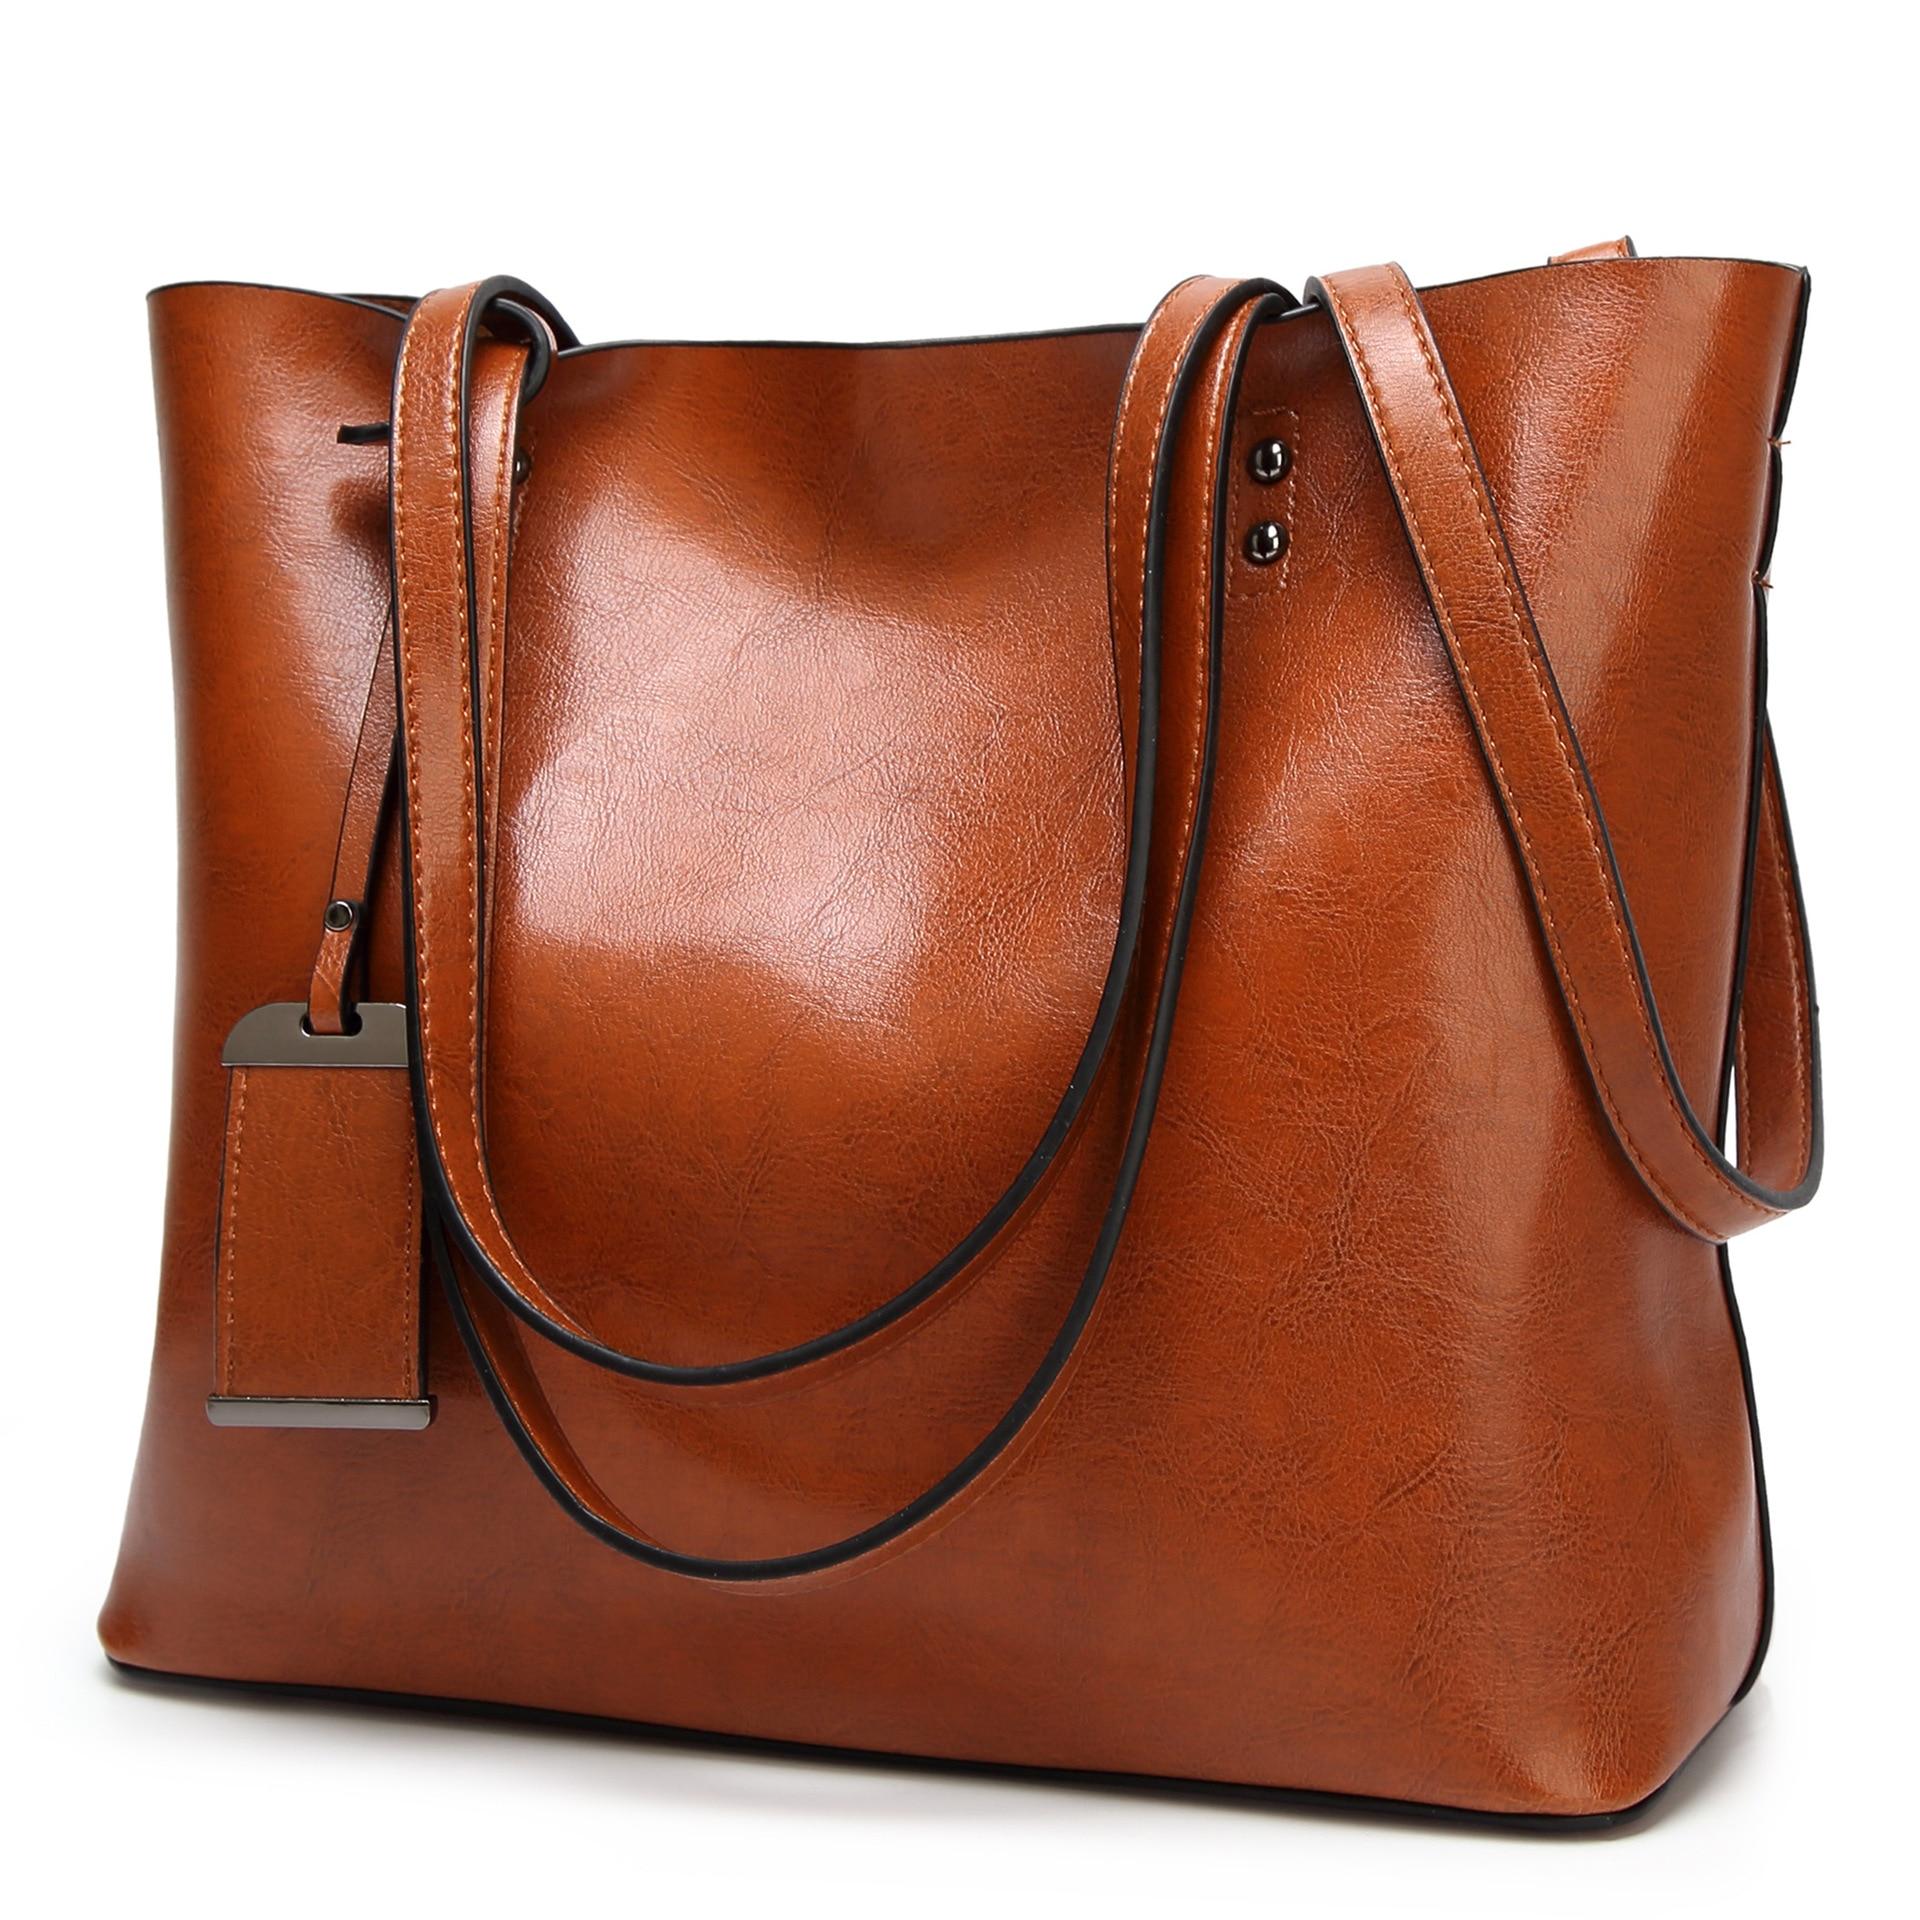 Waxing Leather Bucket Bag Simple Double Strap Handbag Shoulder Bags For Women 2018 All-Purpose Shopping Tote Sac Bolsa Feminina